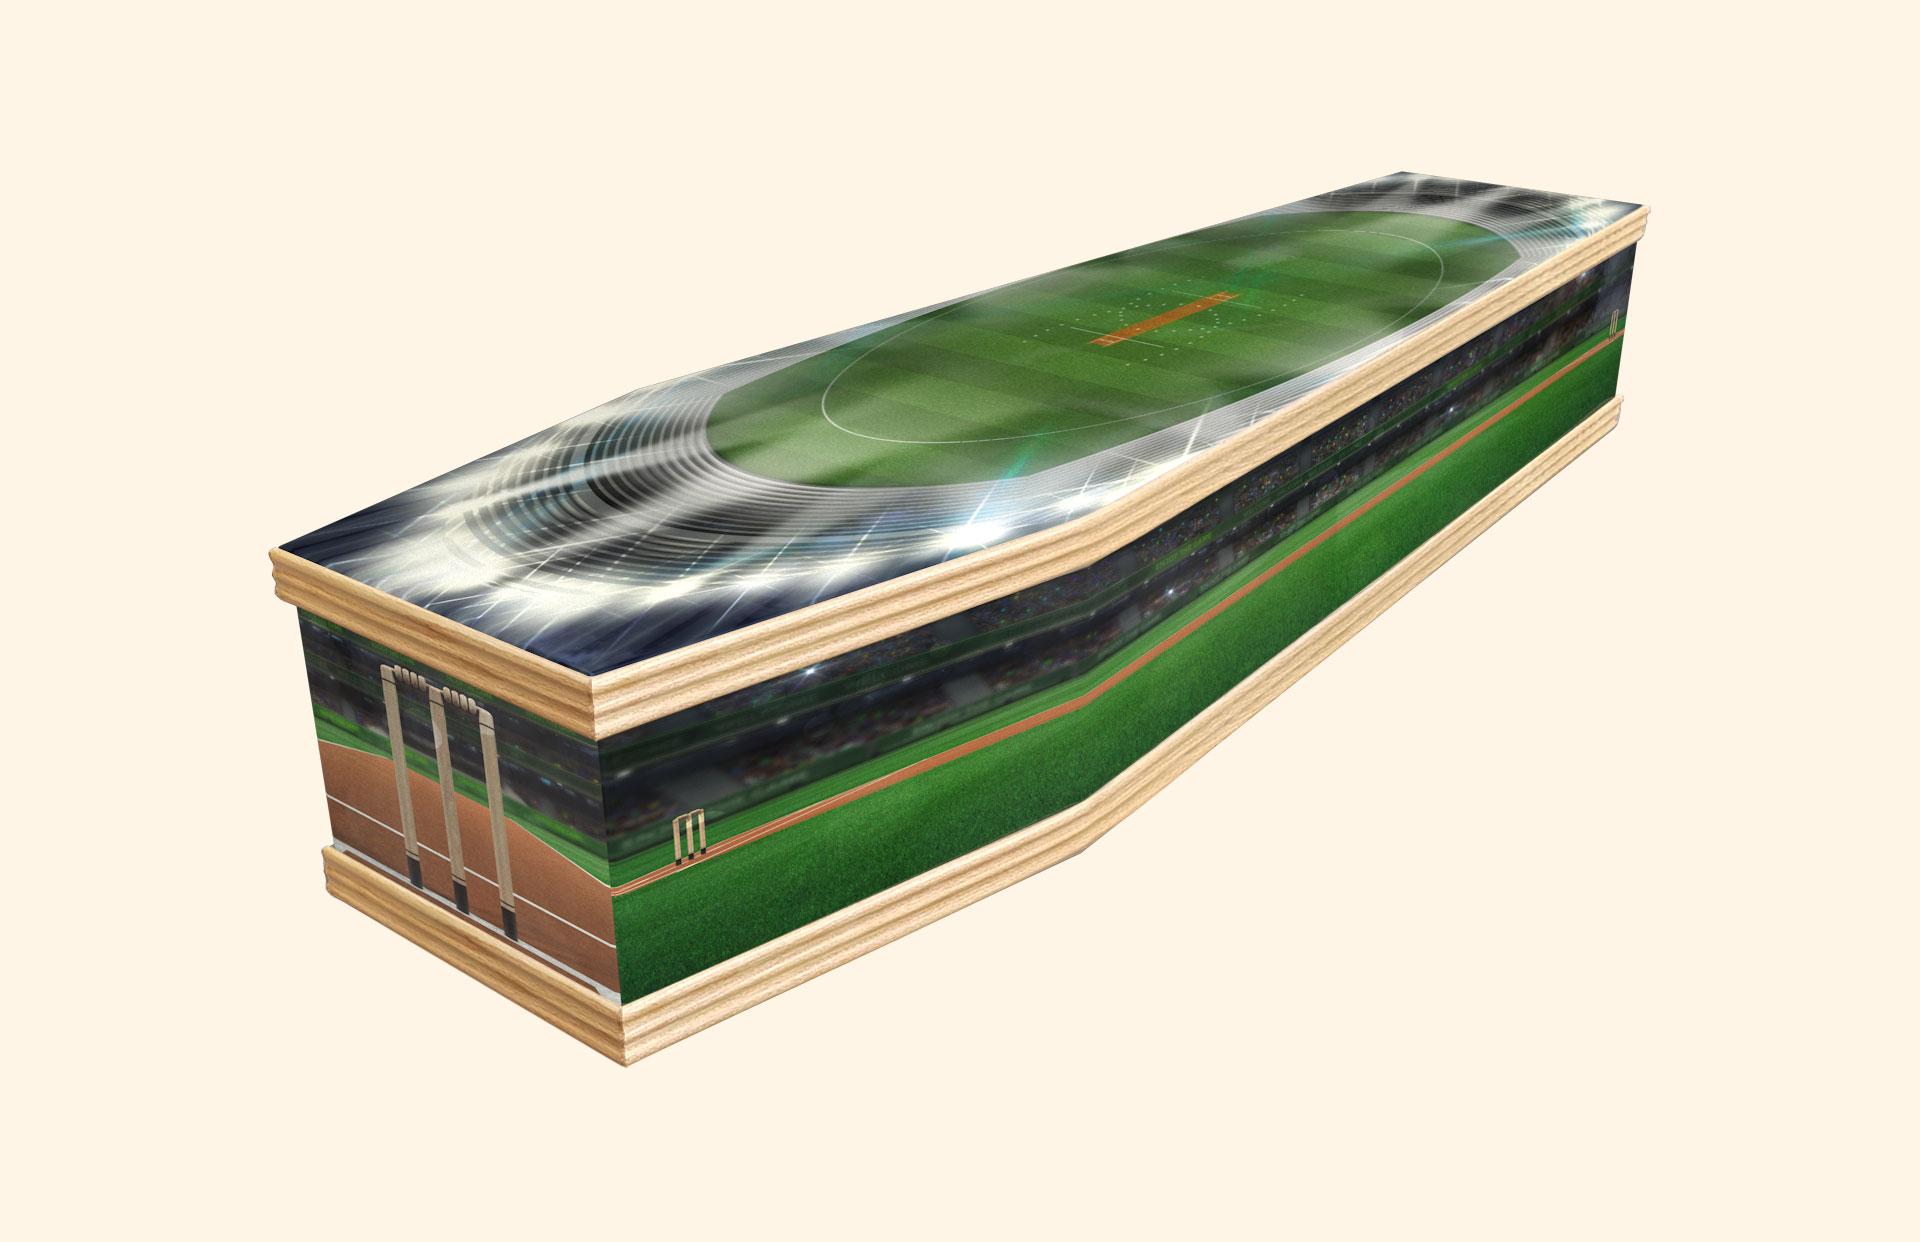 Howzat! Classic coffin